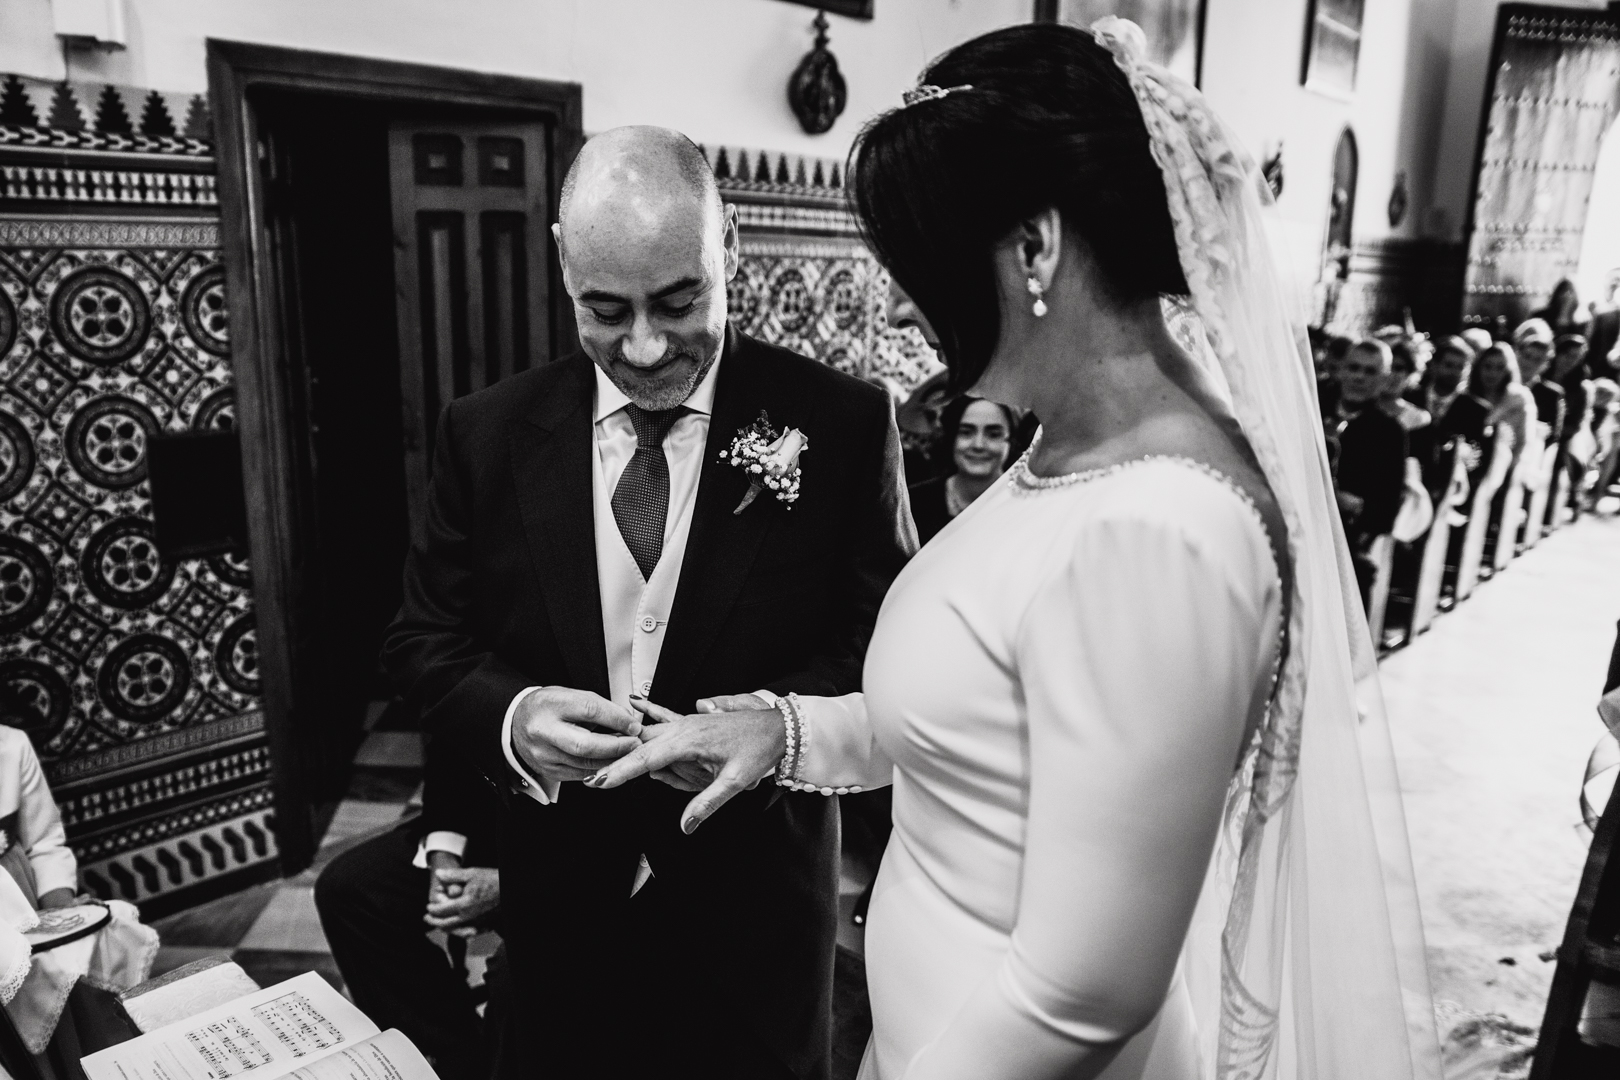 boda hacienda torre doña maria. carlos pavon fotografia. 600257783-161.jpg